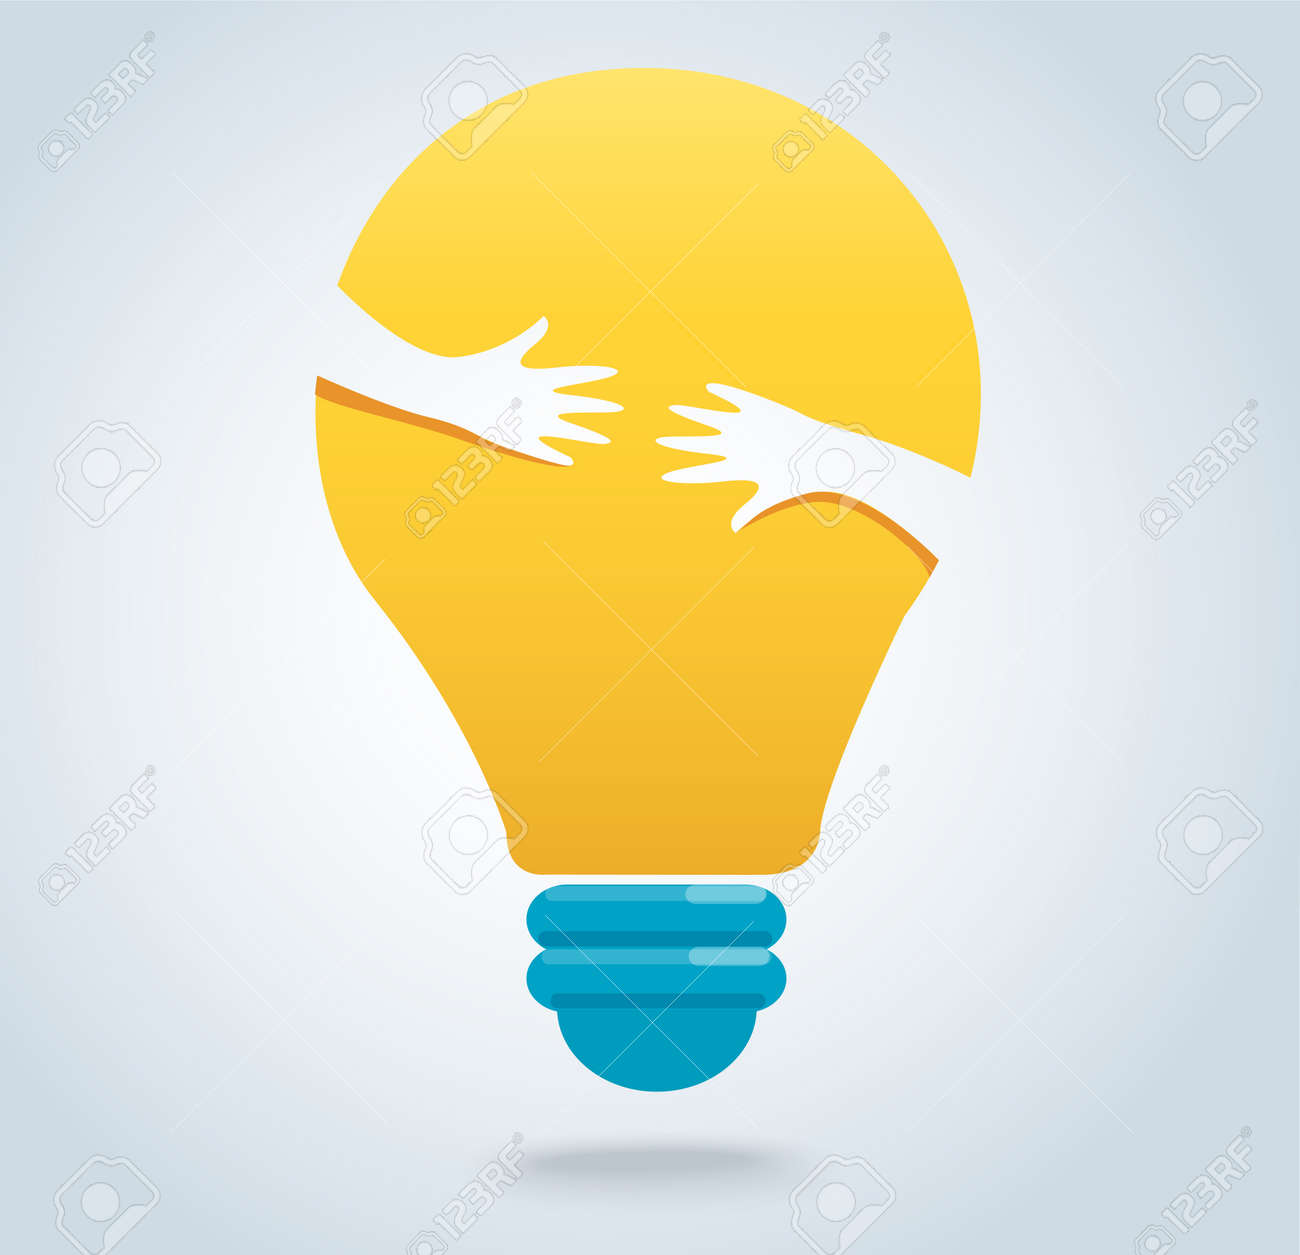 Hands hug the light bulb icon vector, creative concepts - 88090223